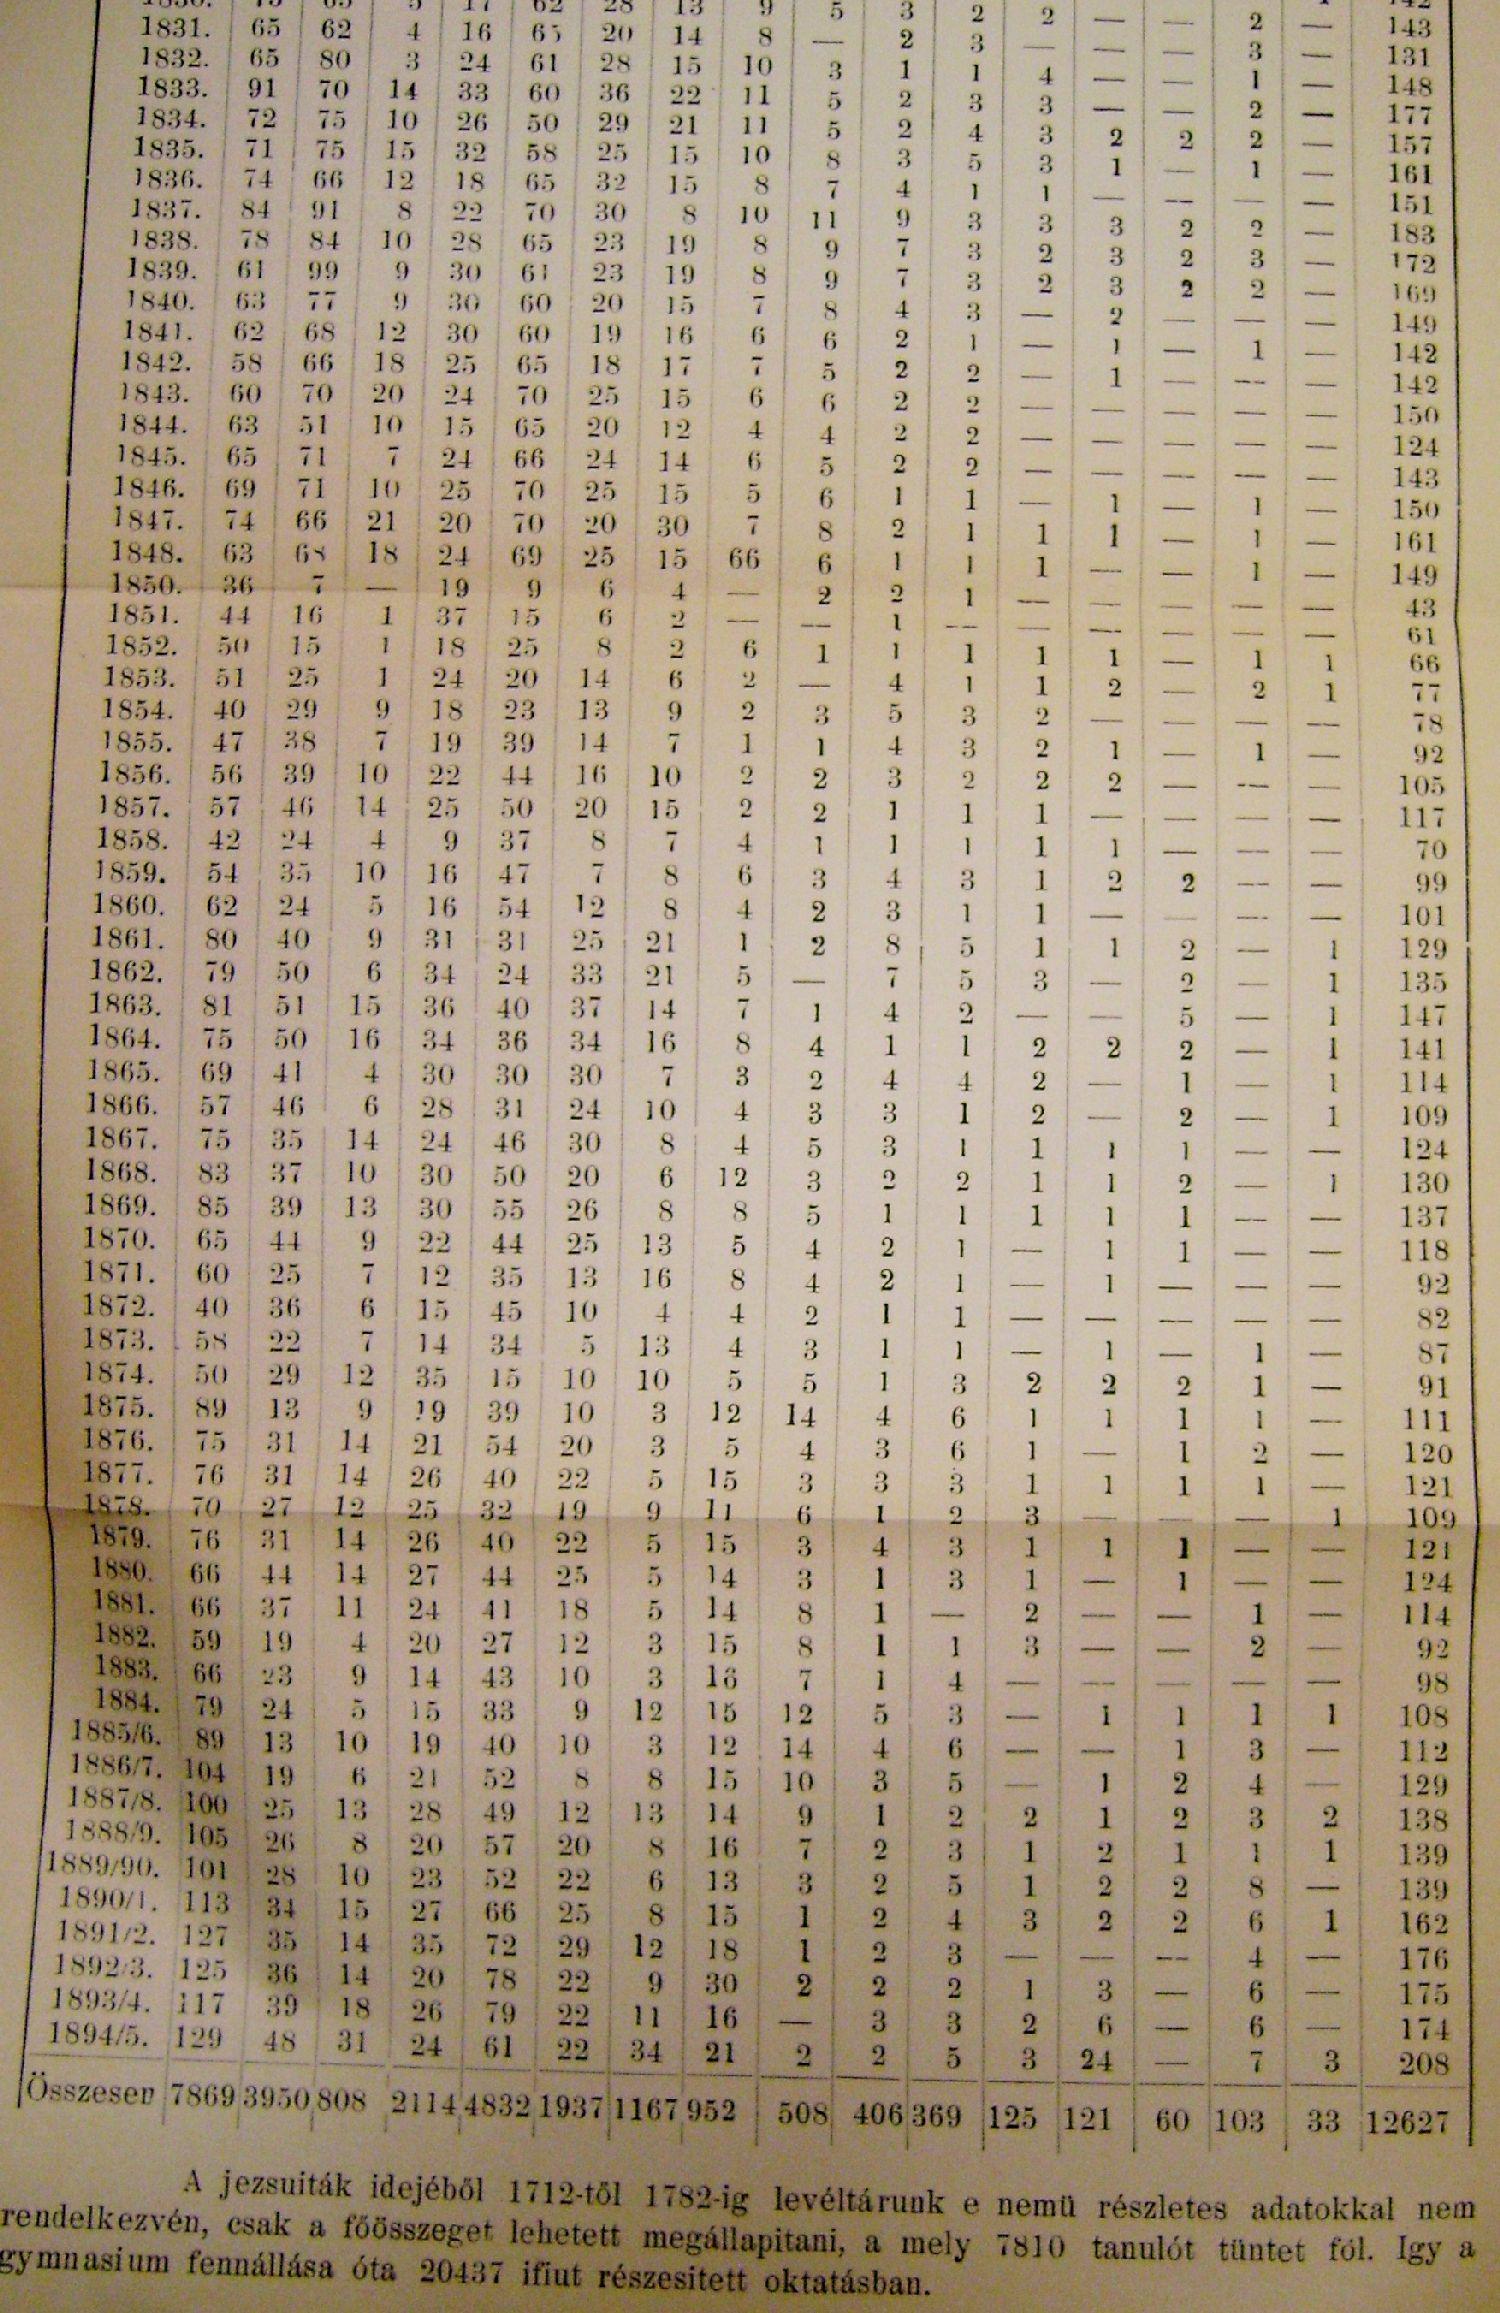 cifre scolarizare gimnaziu catolic targu mures 1782 1895 3